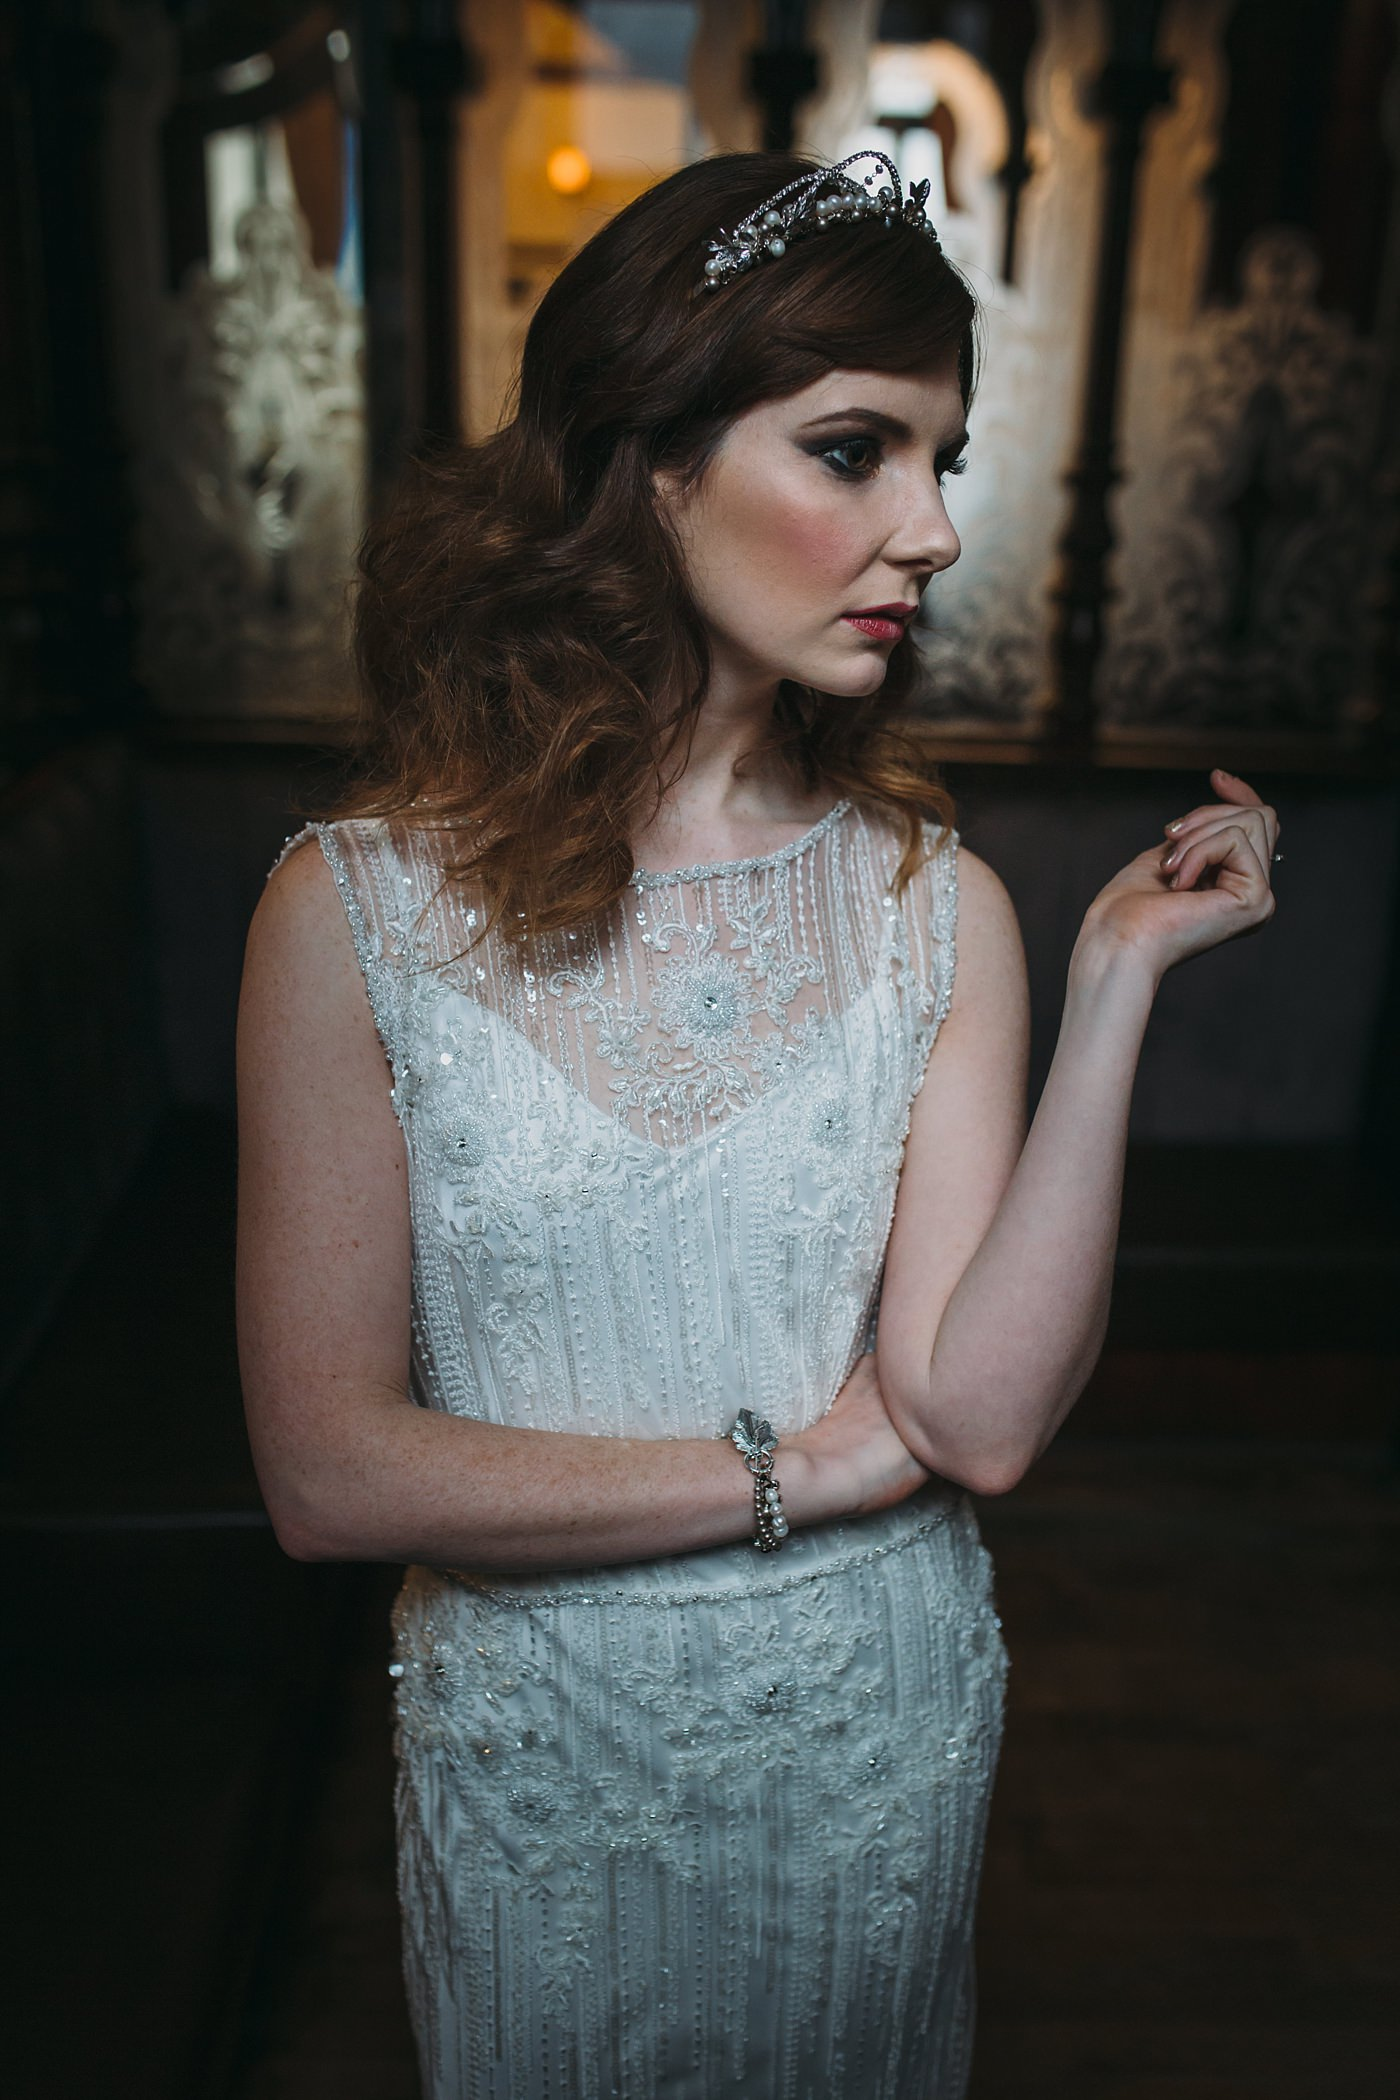 sloans-alternative-wedding-jo-donaldson-photography-flossy-and-dossy-modiste-cameo-bridal-styling-cat-robertson-mua_0199.jpg